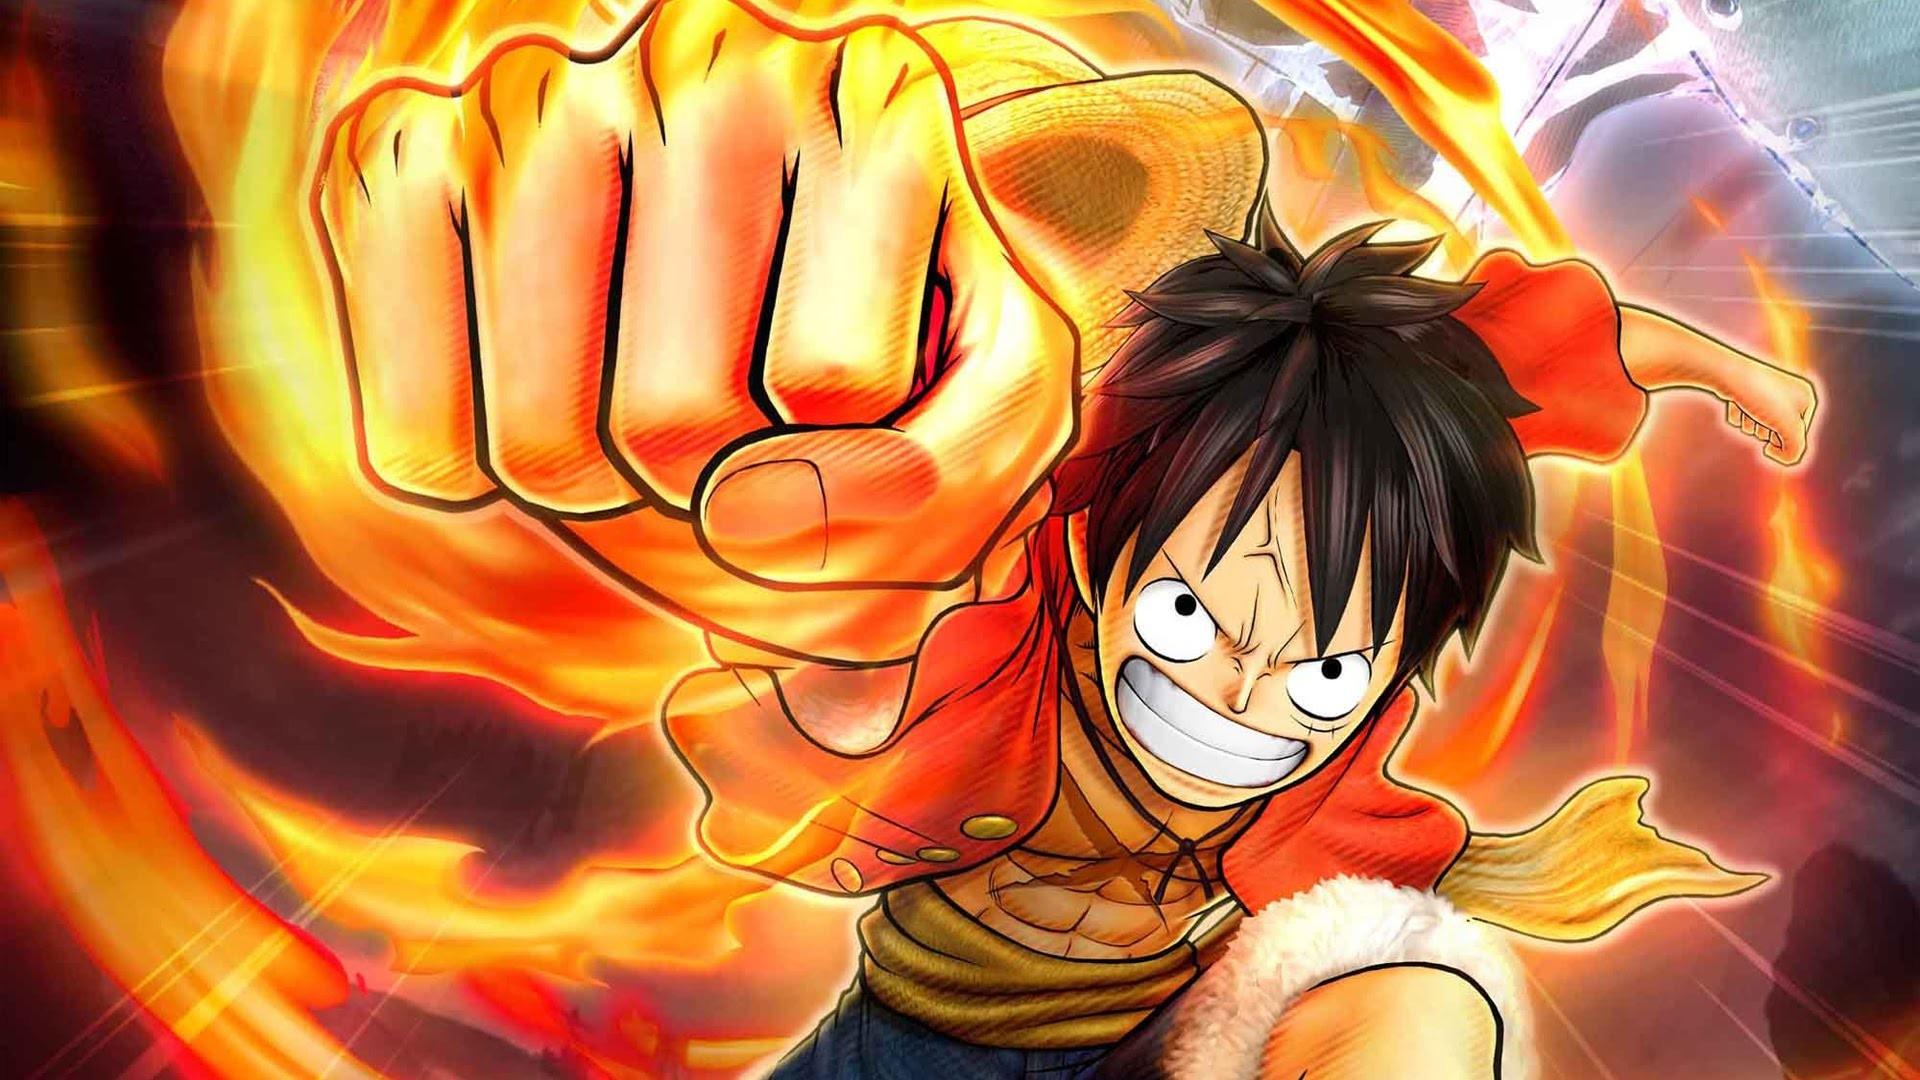 Download 500+ Wallpaper Abyss One Piece HD Gratis